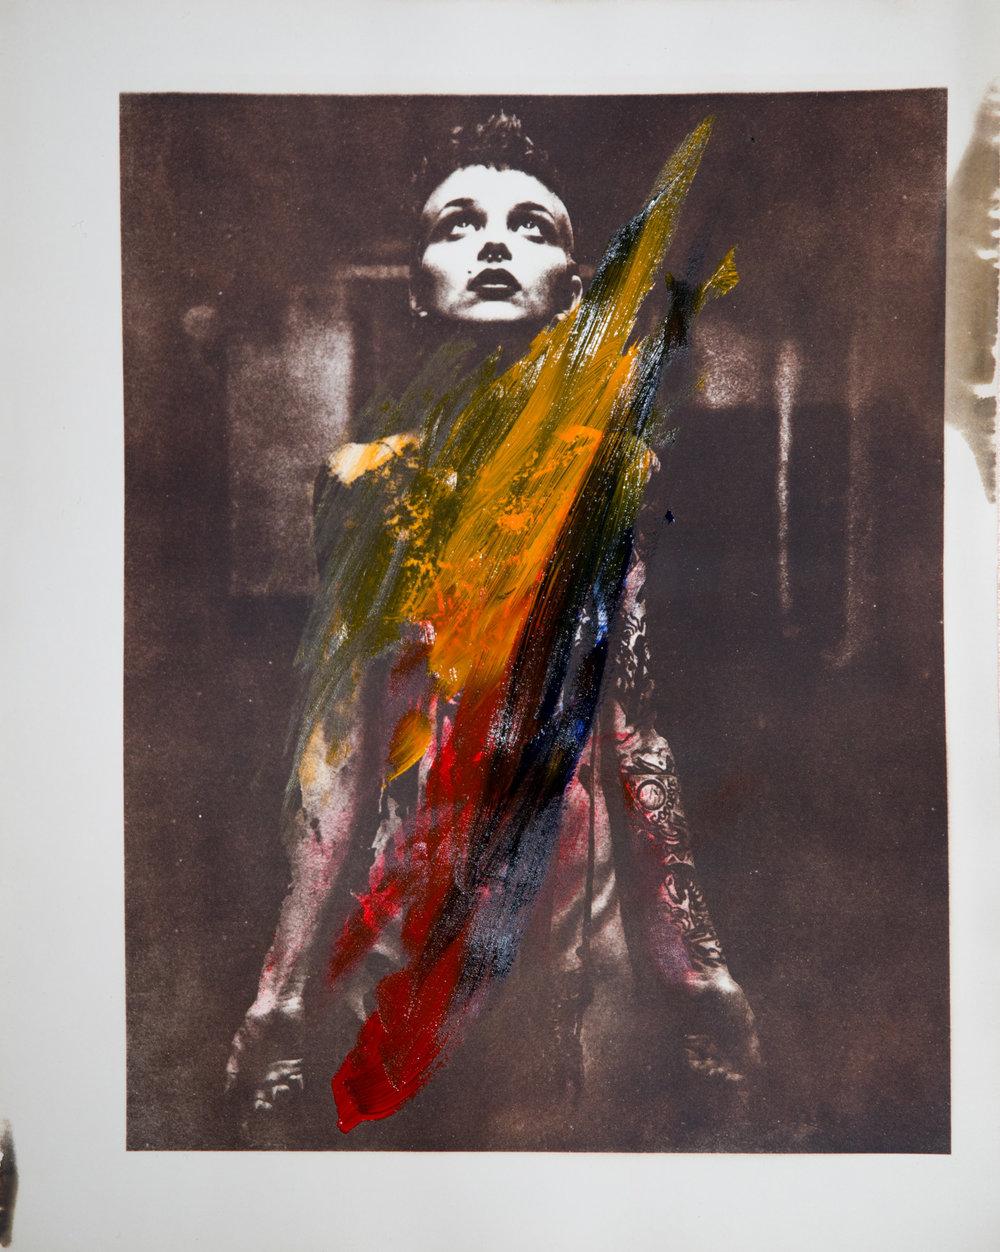 - 24x30cm, Silver Gelatin, Oil paintModel: Lindsay / @lindsaysalterego